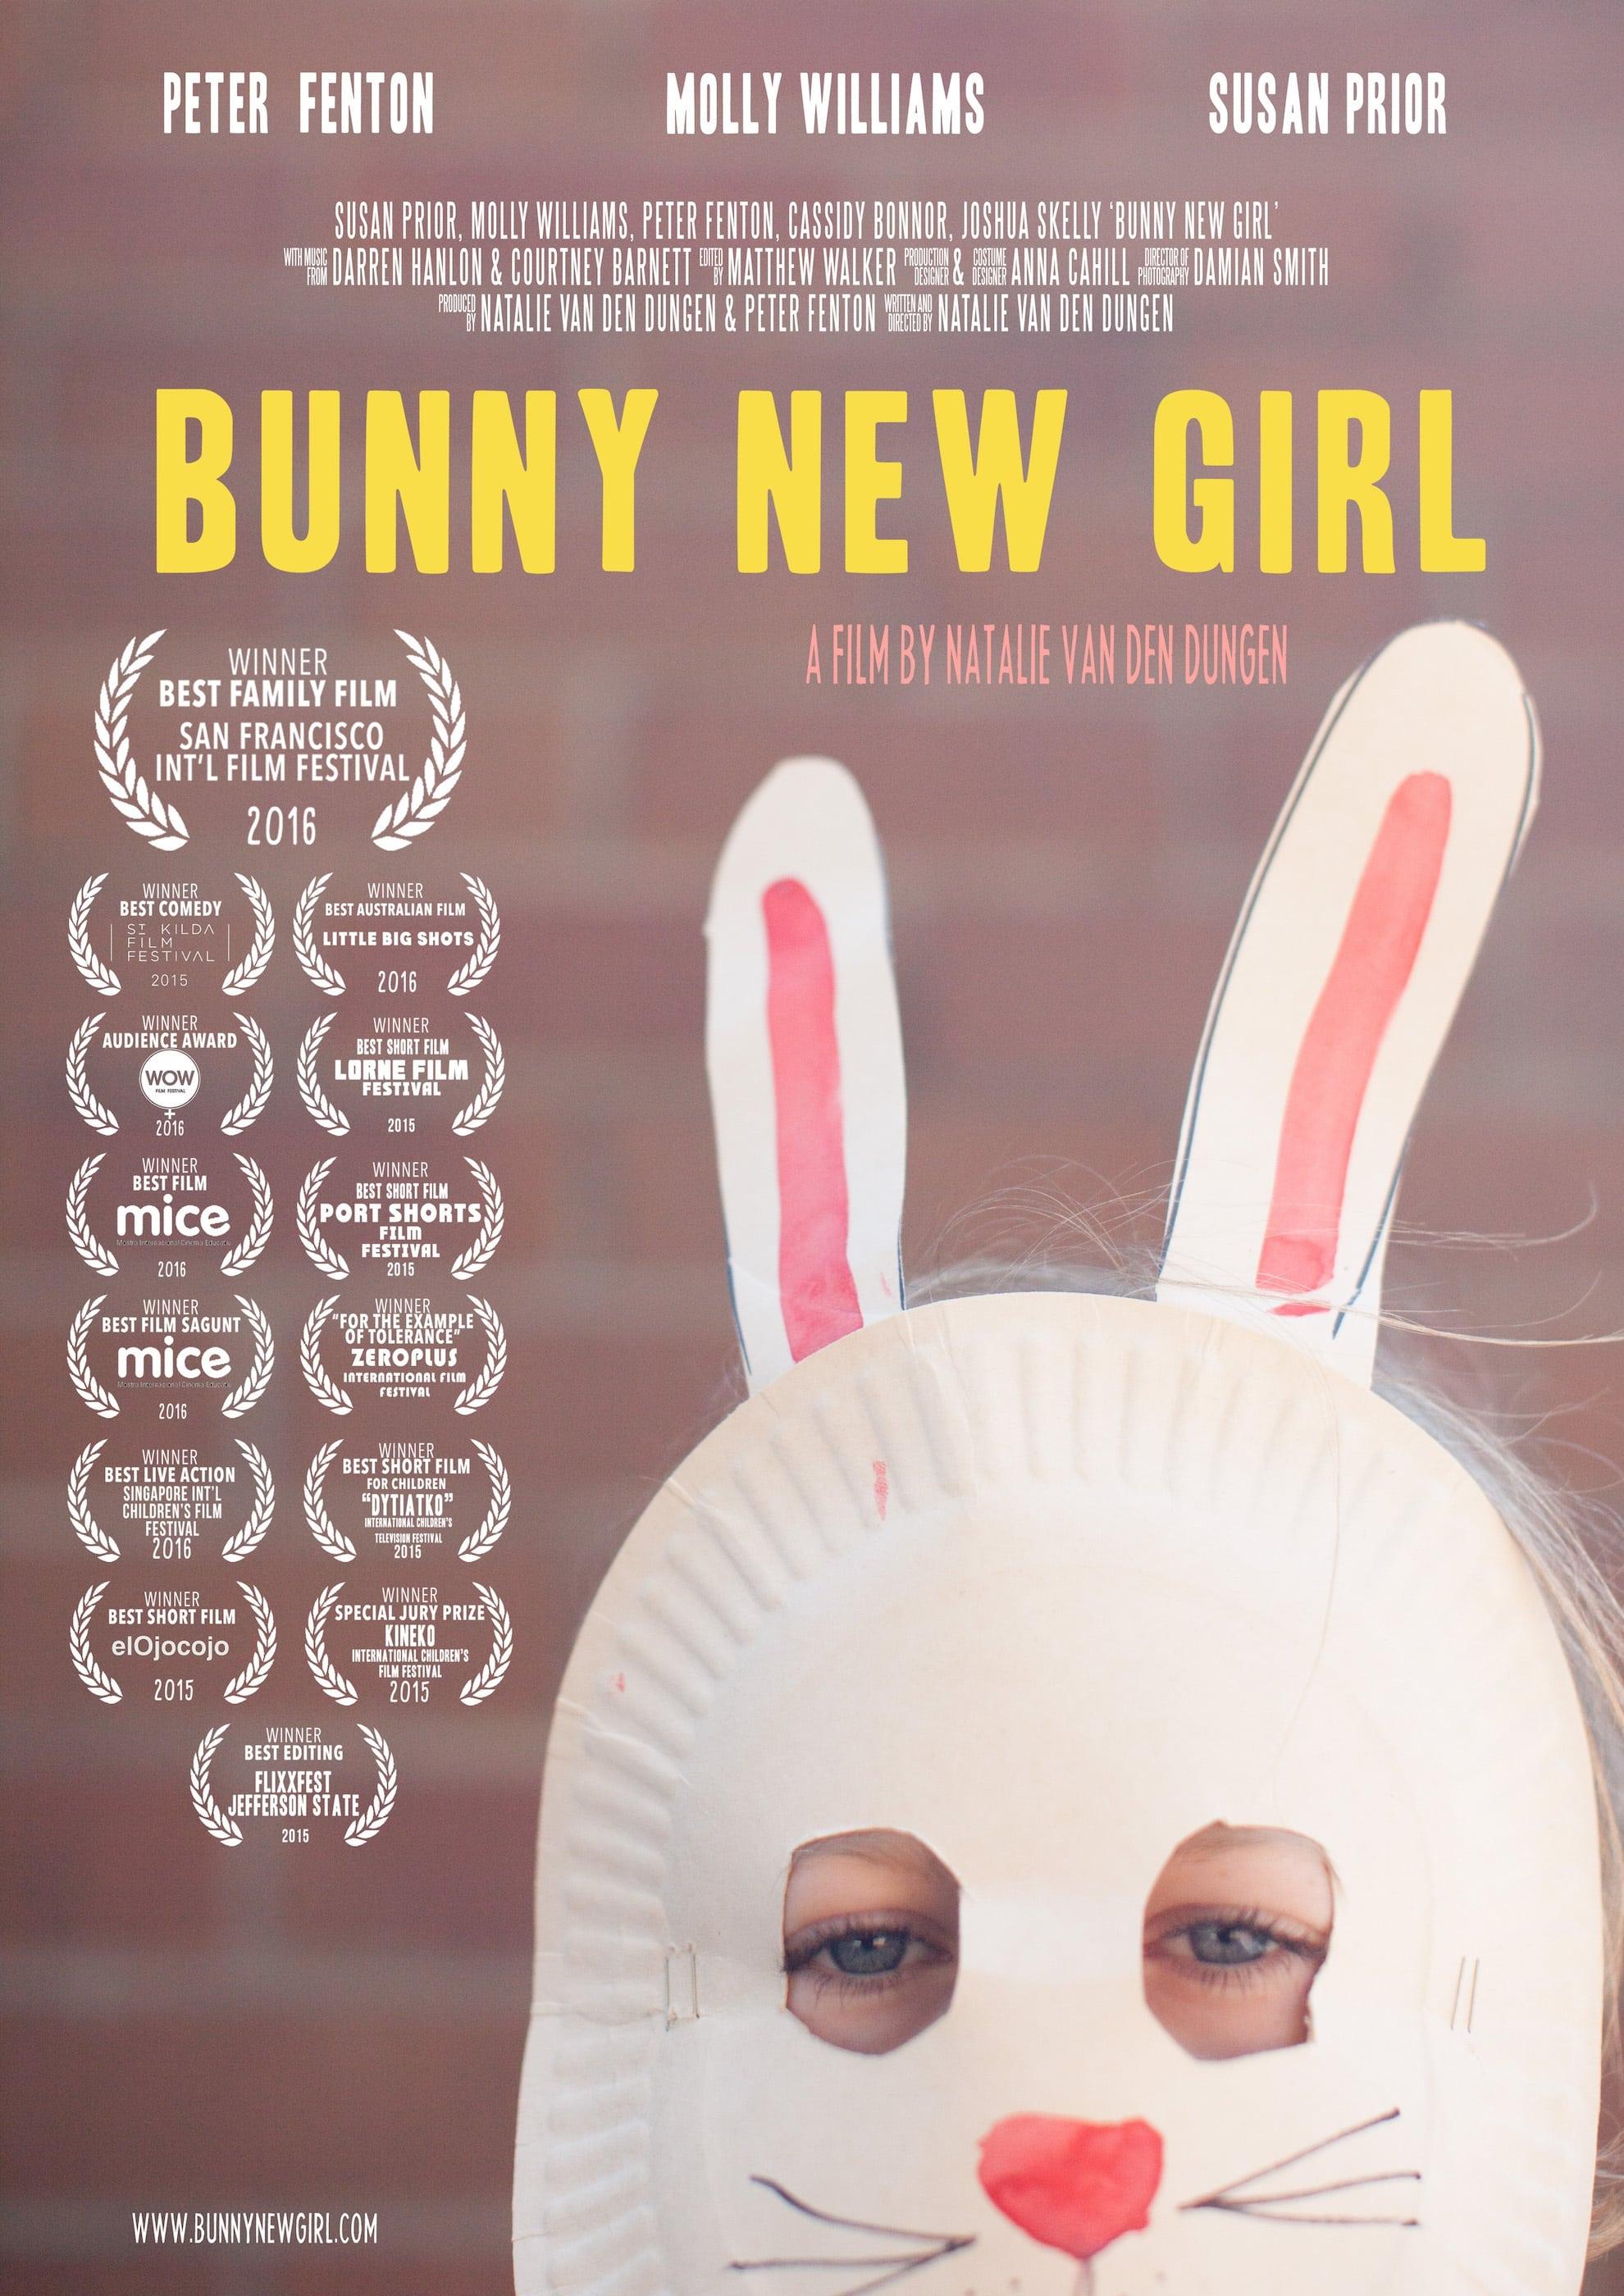 Bunny New Girl (2015)